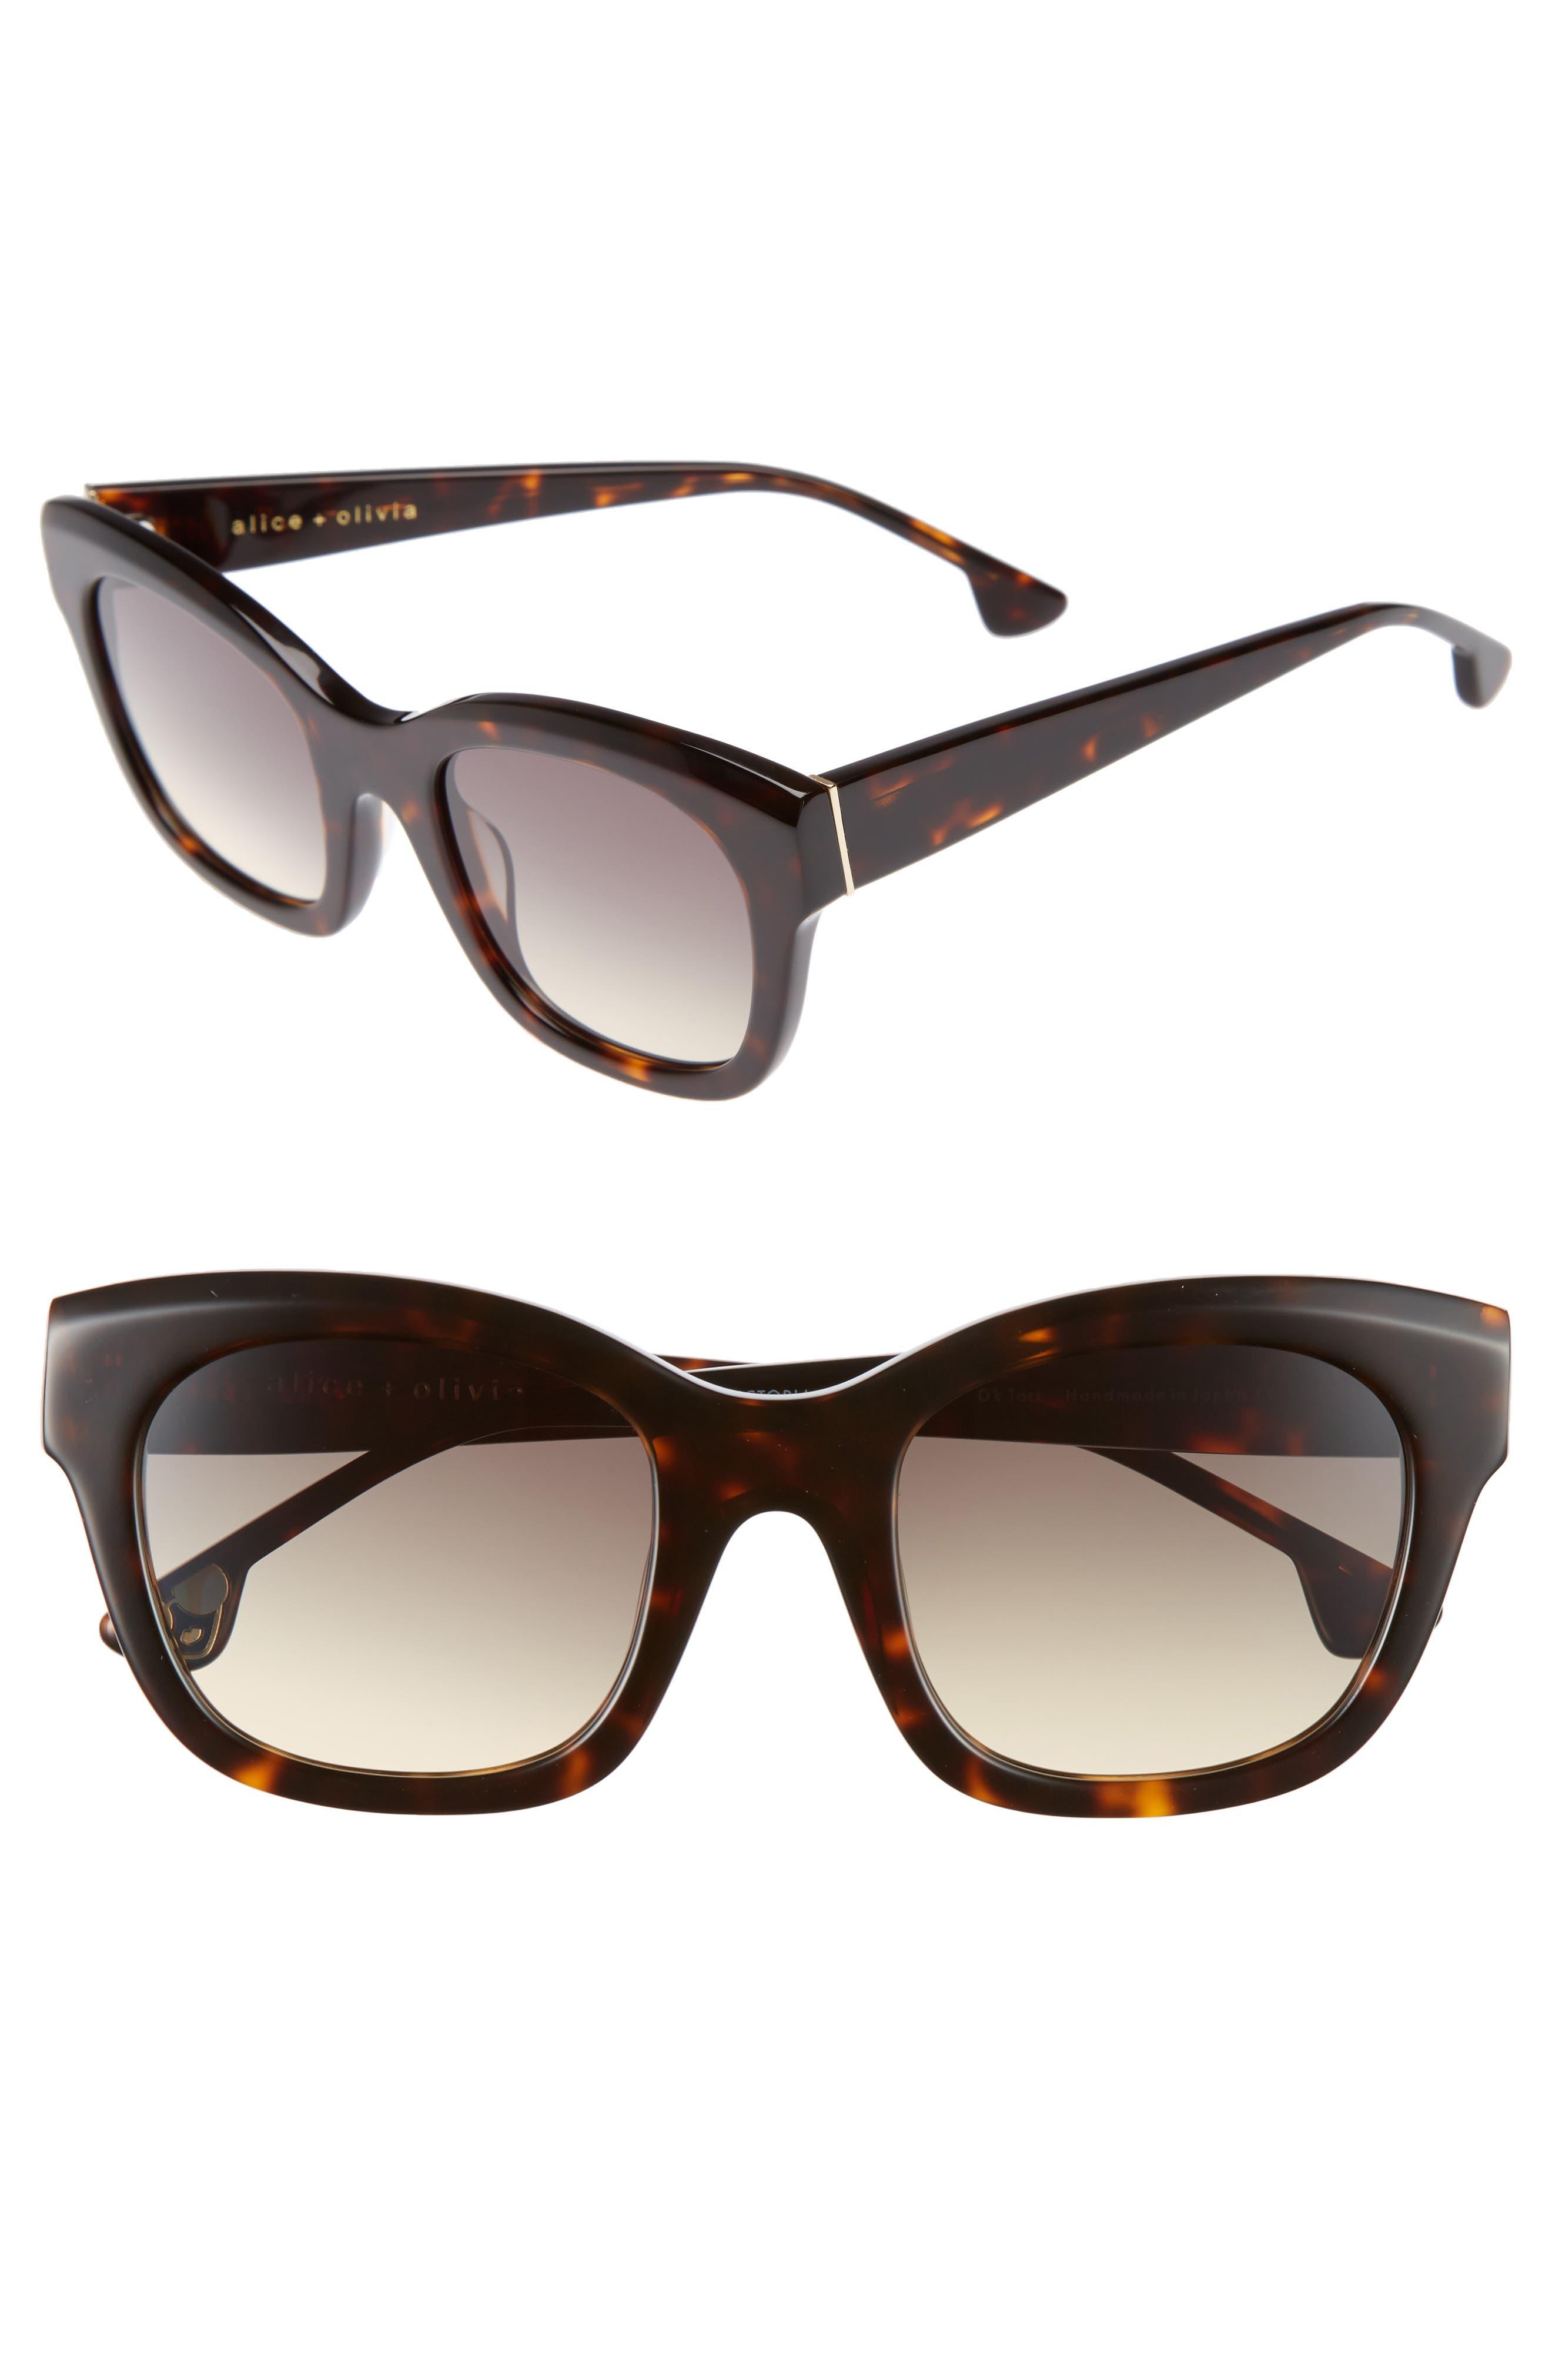 Alice + Olivia Victoria 50mm Cat Eye Sunglasses